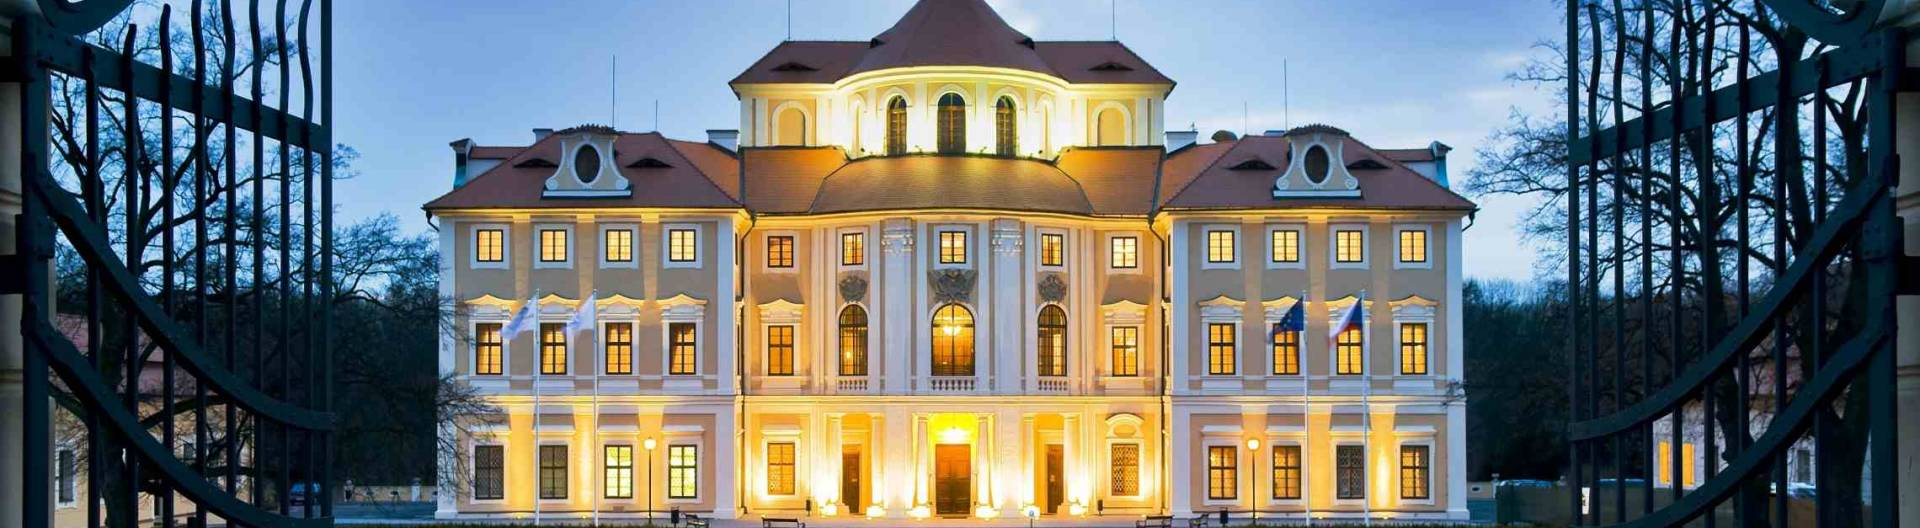 Liblice-linnahotelli-Tsekki-Praha-1920x528.jpg